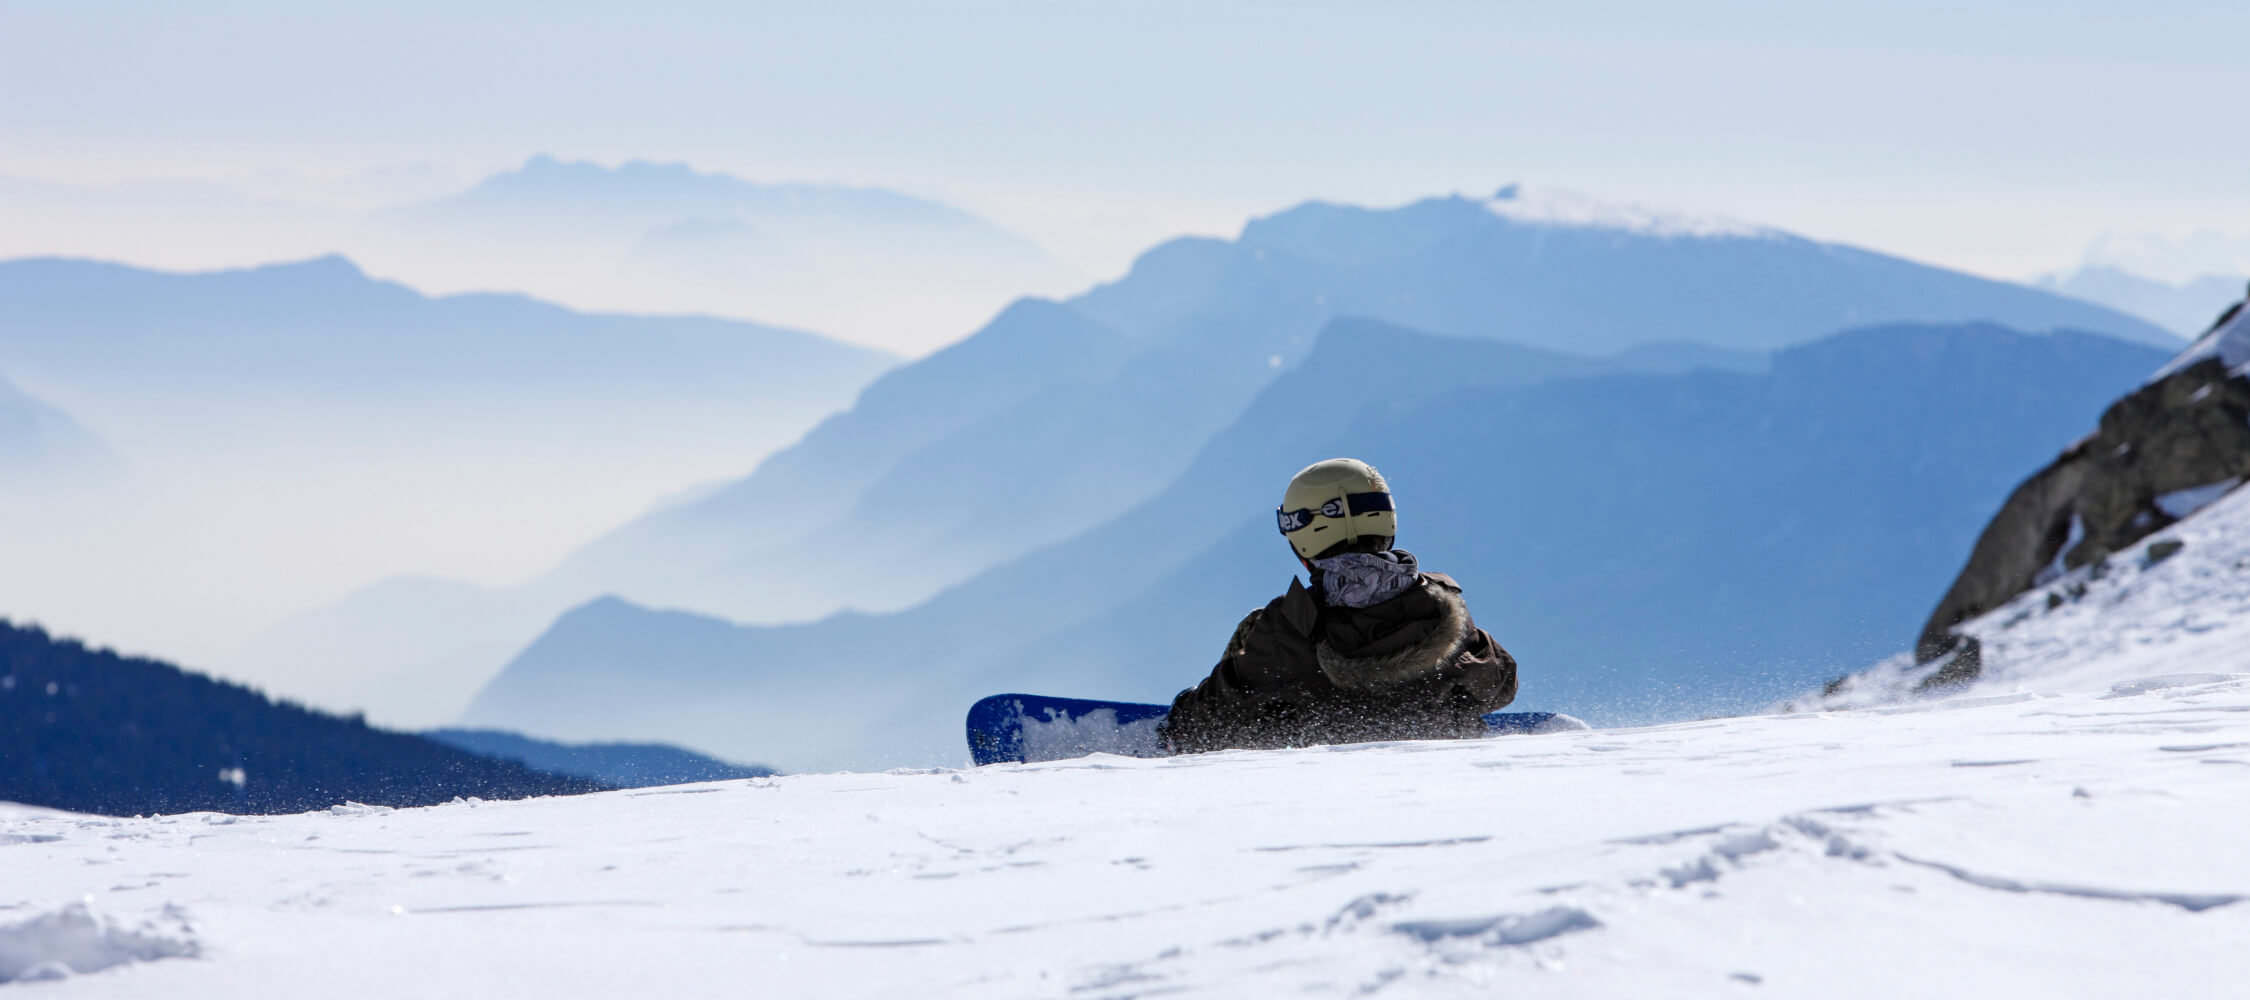 Italien-Trentino_Suedtirol_Alto_Adige_Merano_Meran_Natur_Sport_Winter_Schnee_Ski_Snowboard_Panorama_Berge_MGM-Frieder-Blickle_mgm00181frbl_2250x1000